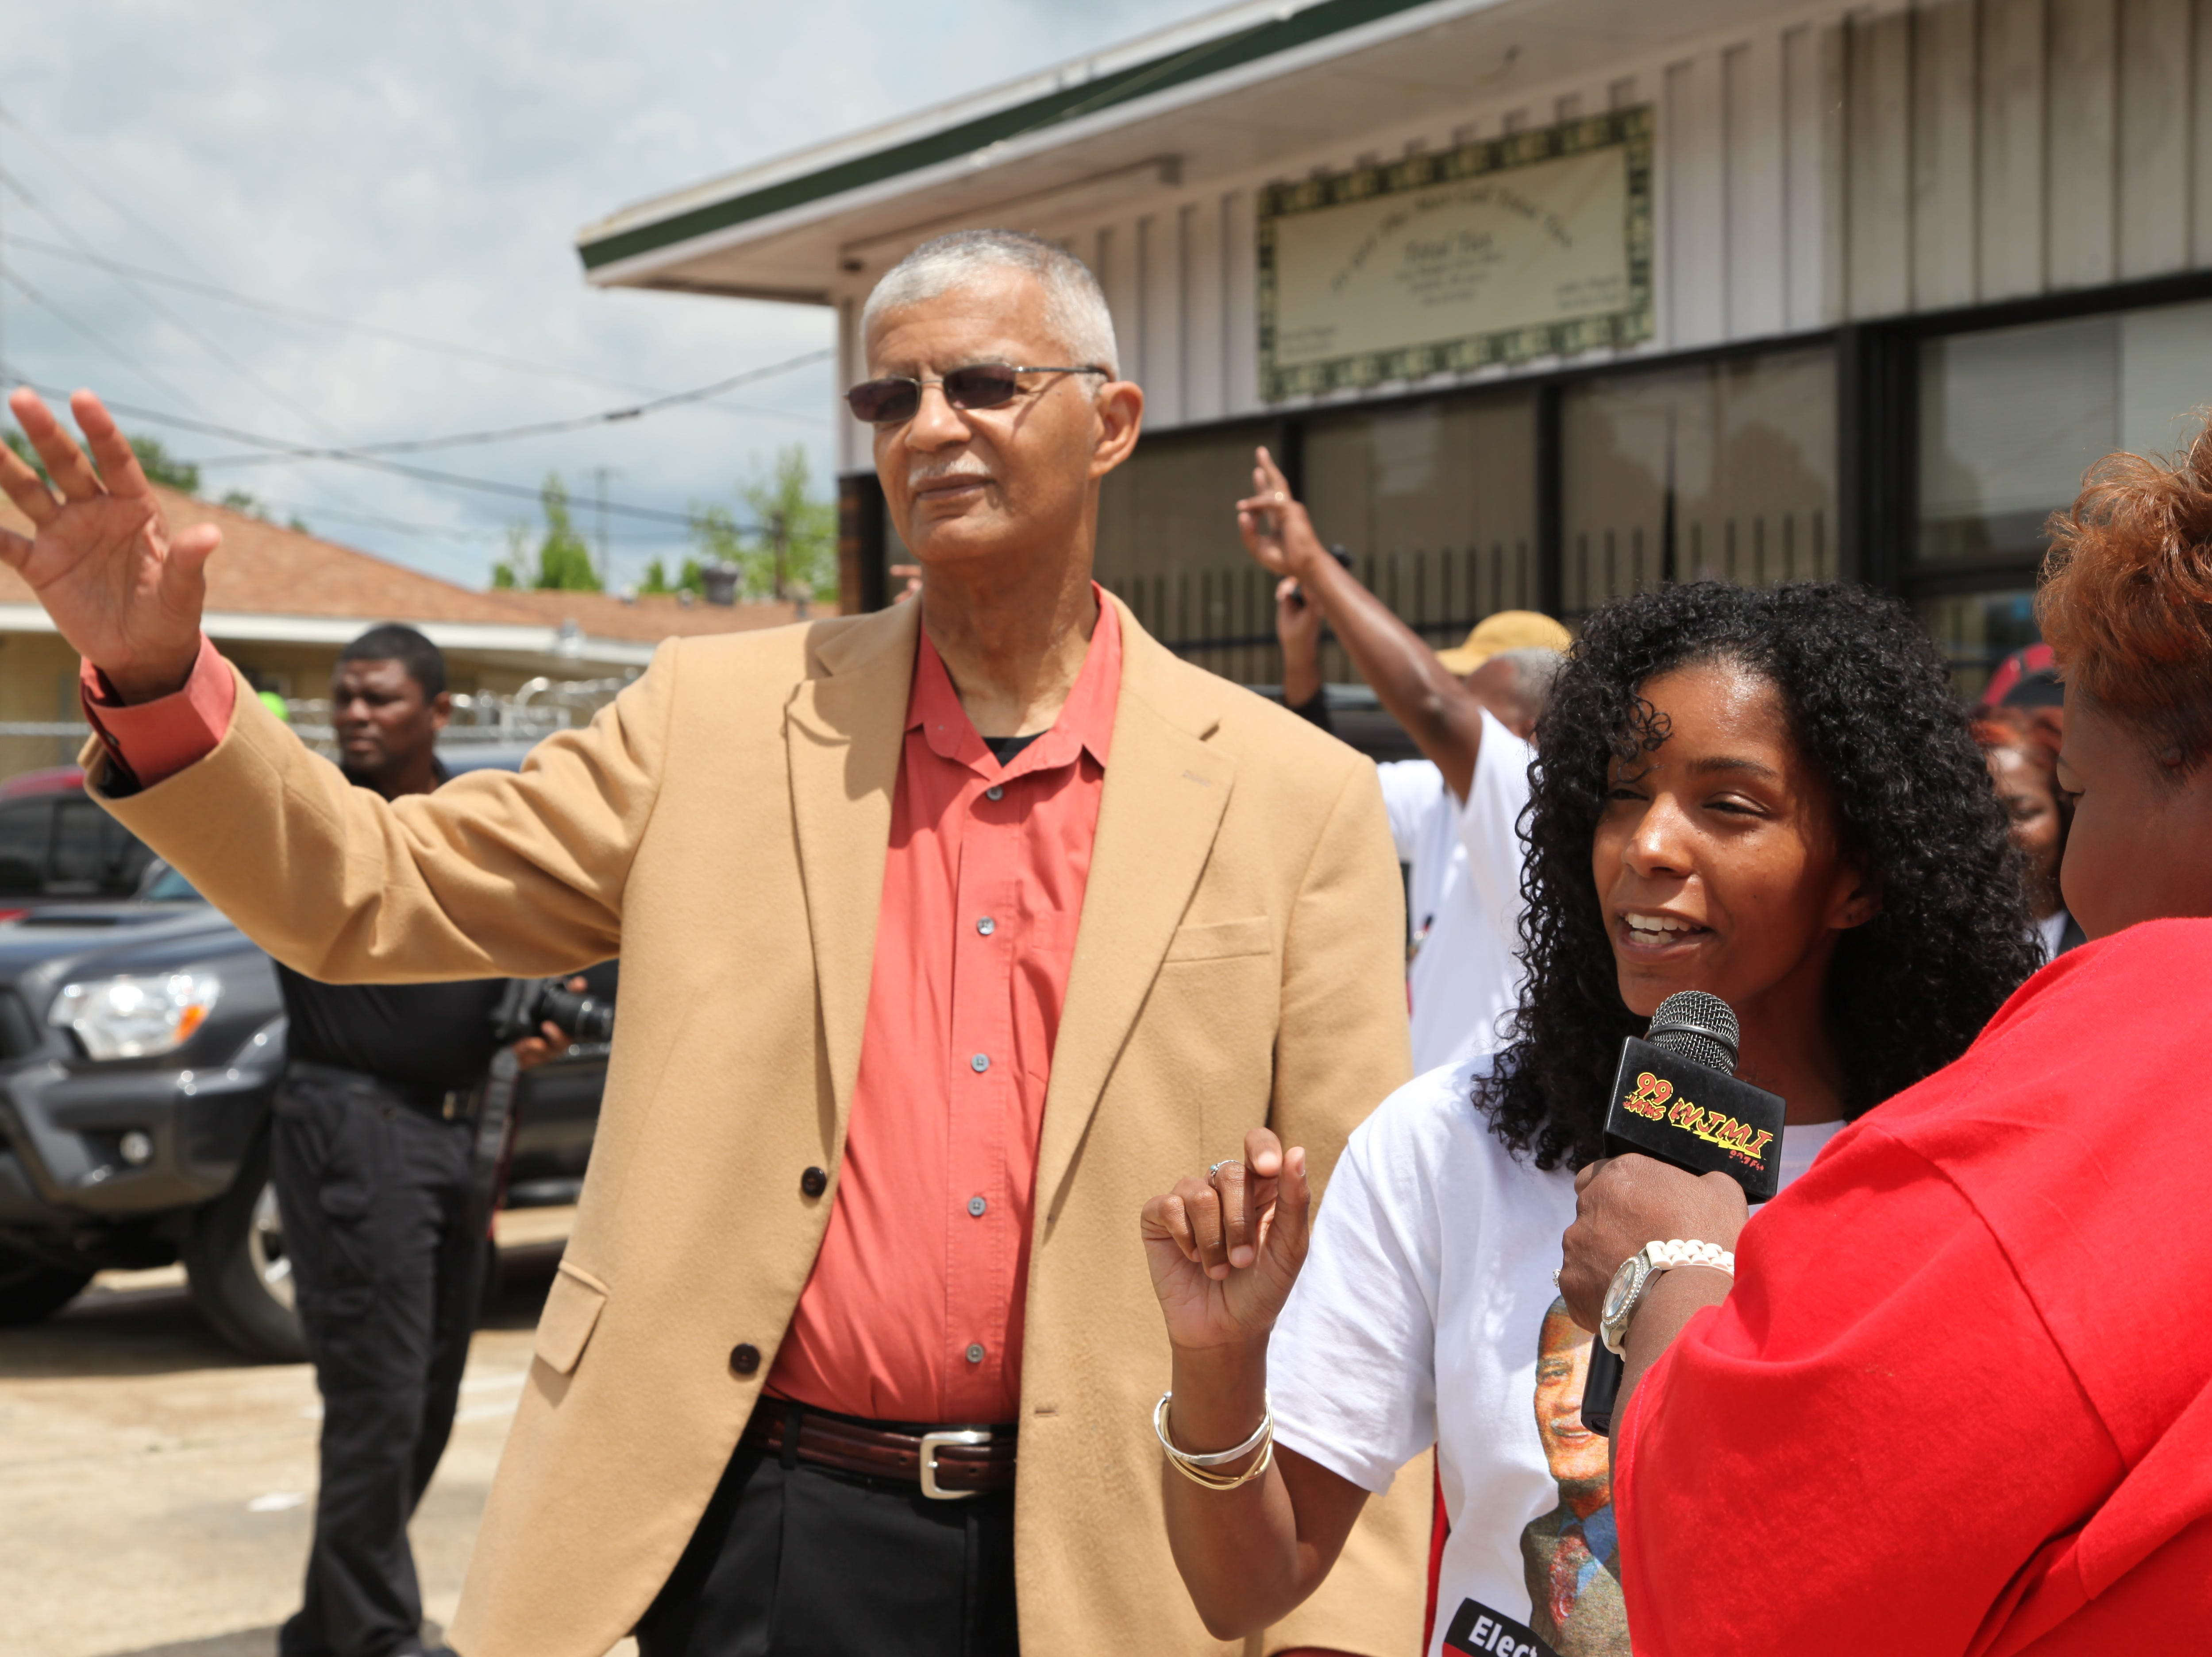 Jackson mayoral candidate Chokwe Lumumba and his daughter, Rukia Lumumba, are interviewed at campaign headquarters by 99.7 FM, WJMI.